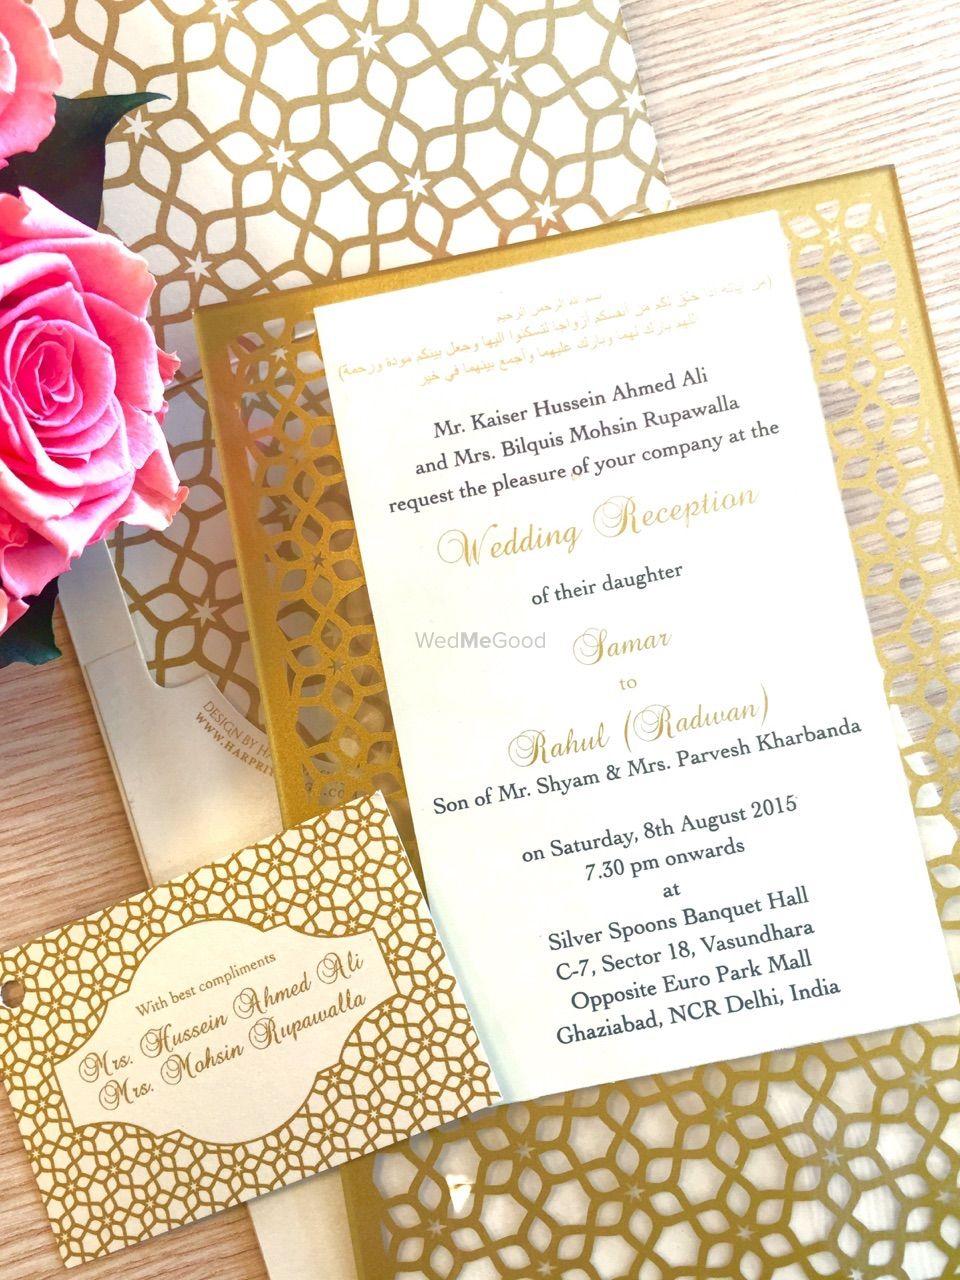 Photo By Design by Harpriya Singh - Invitations